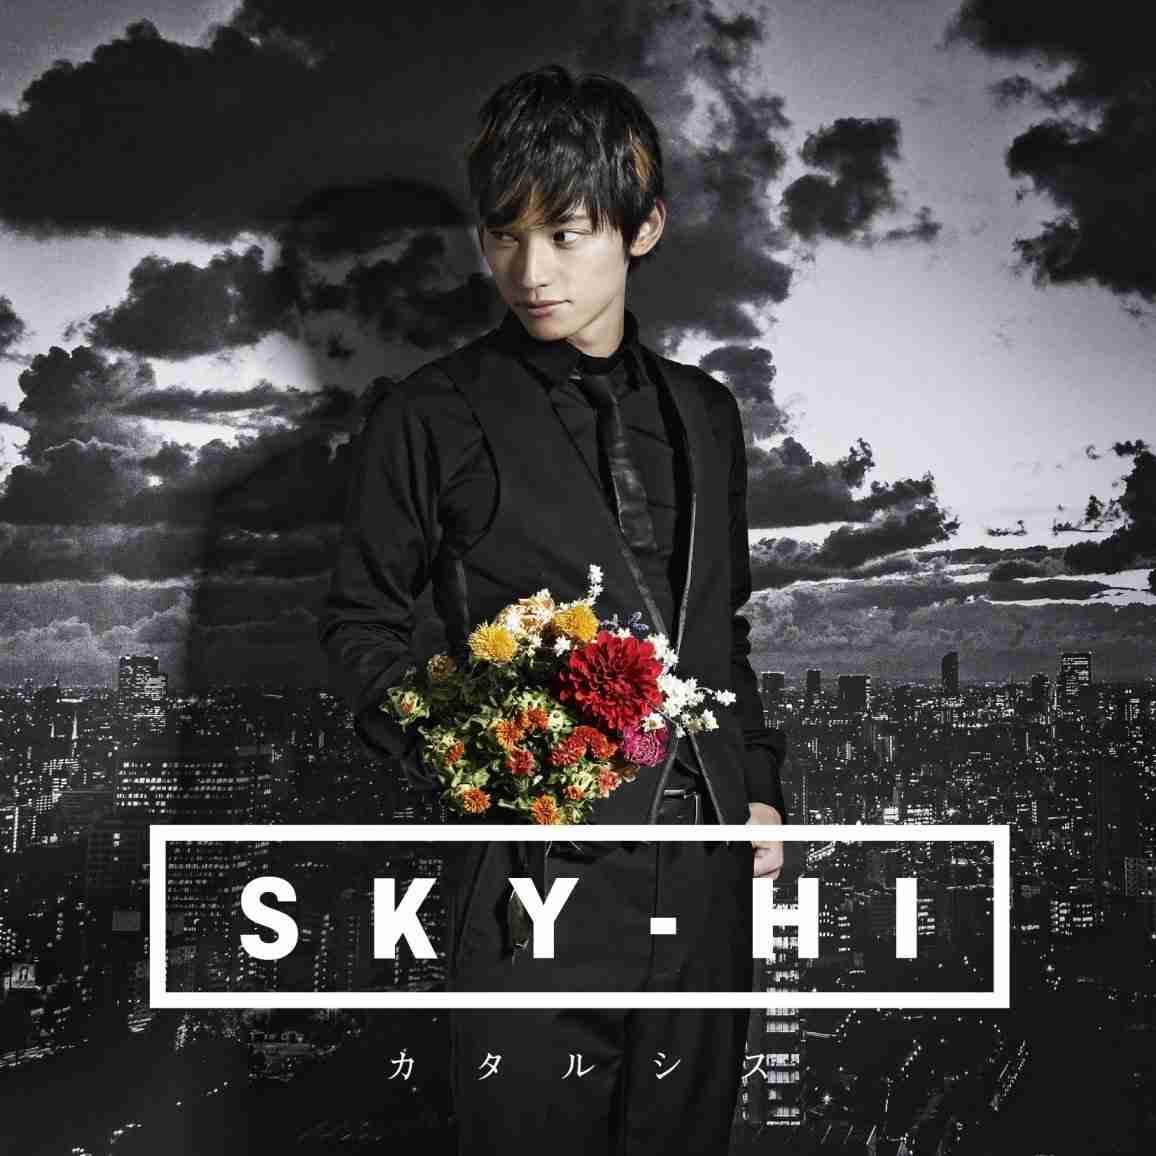 SKY-HIが楽曲「キョウボウザイ」をドロップし波紋 日本語ラップの変化 (KAI-YOU.net) - Yahoo!ニュース